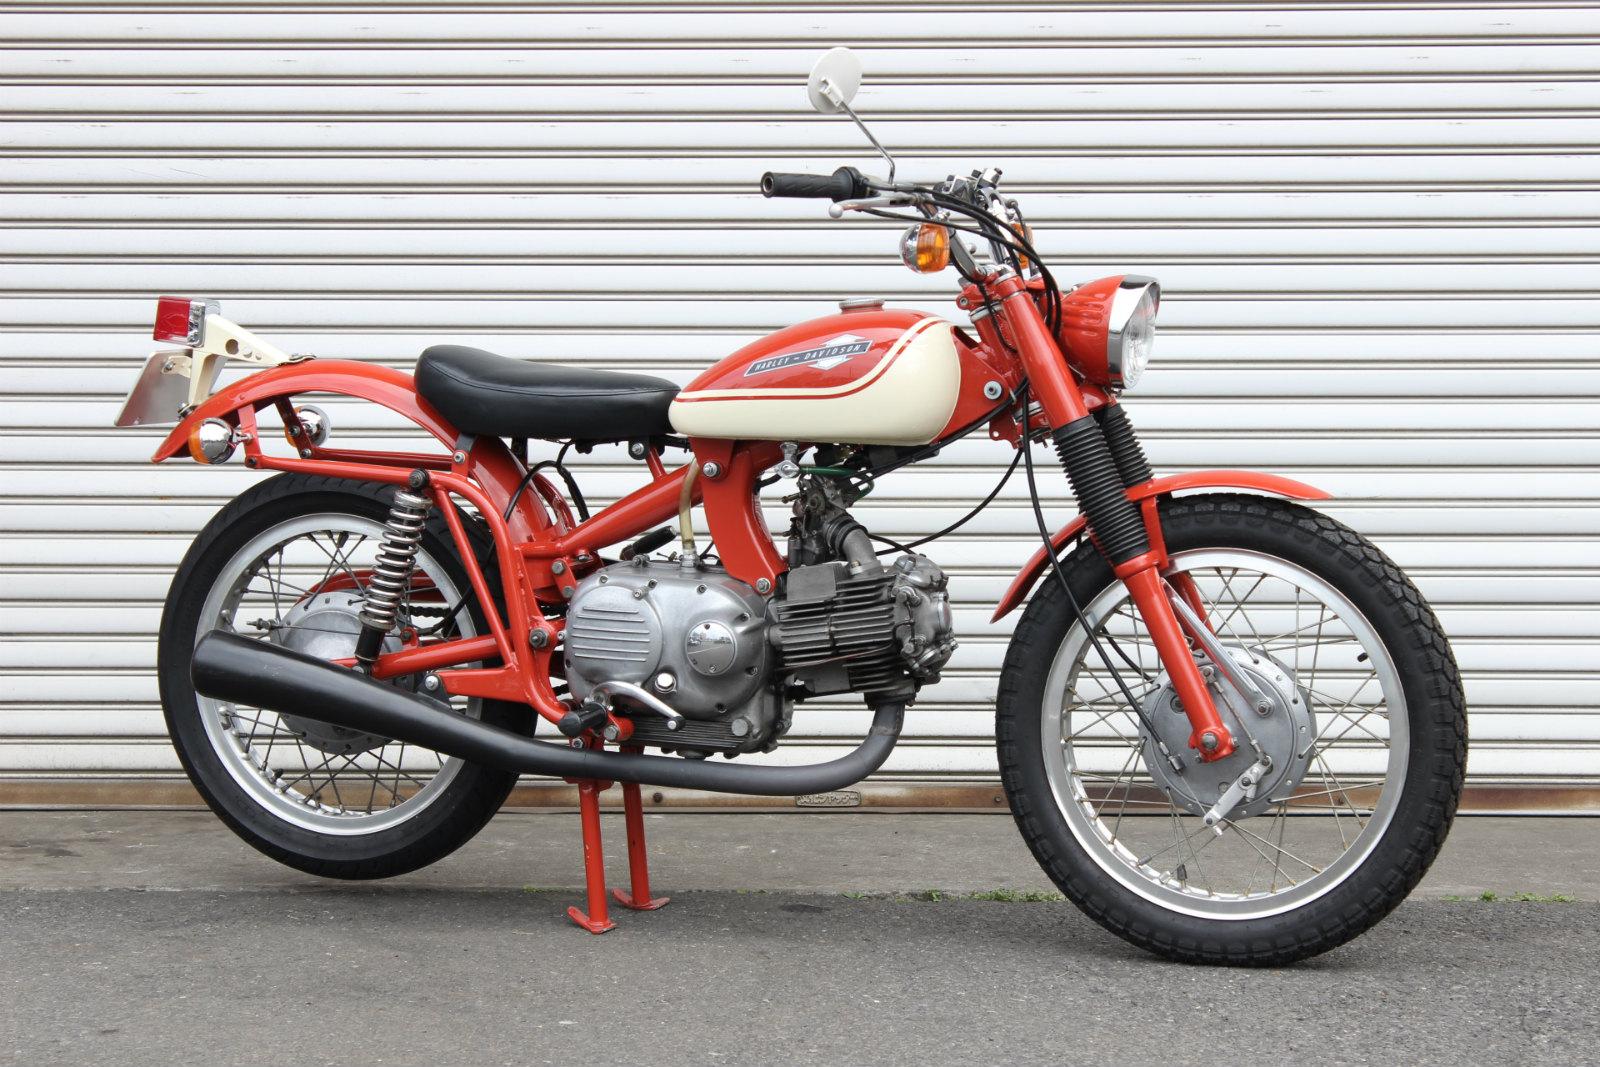 Harley Davidson Sprint_a0208987_14111451.jpg